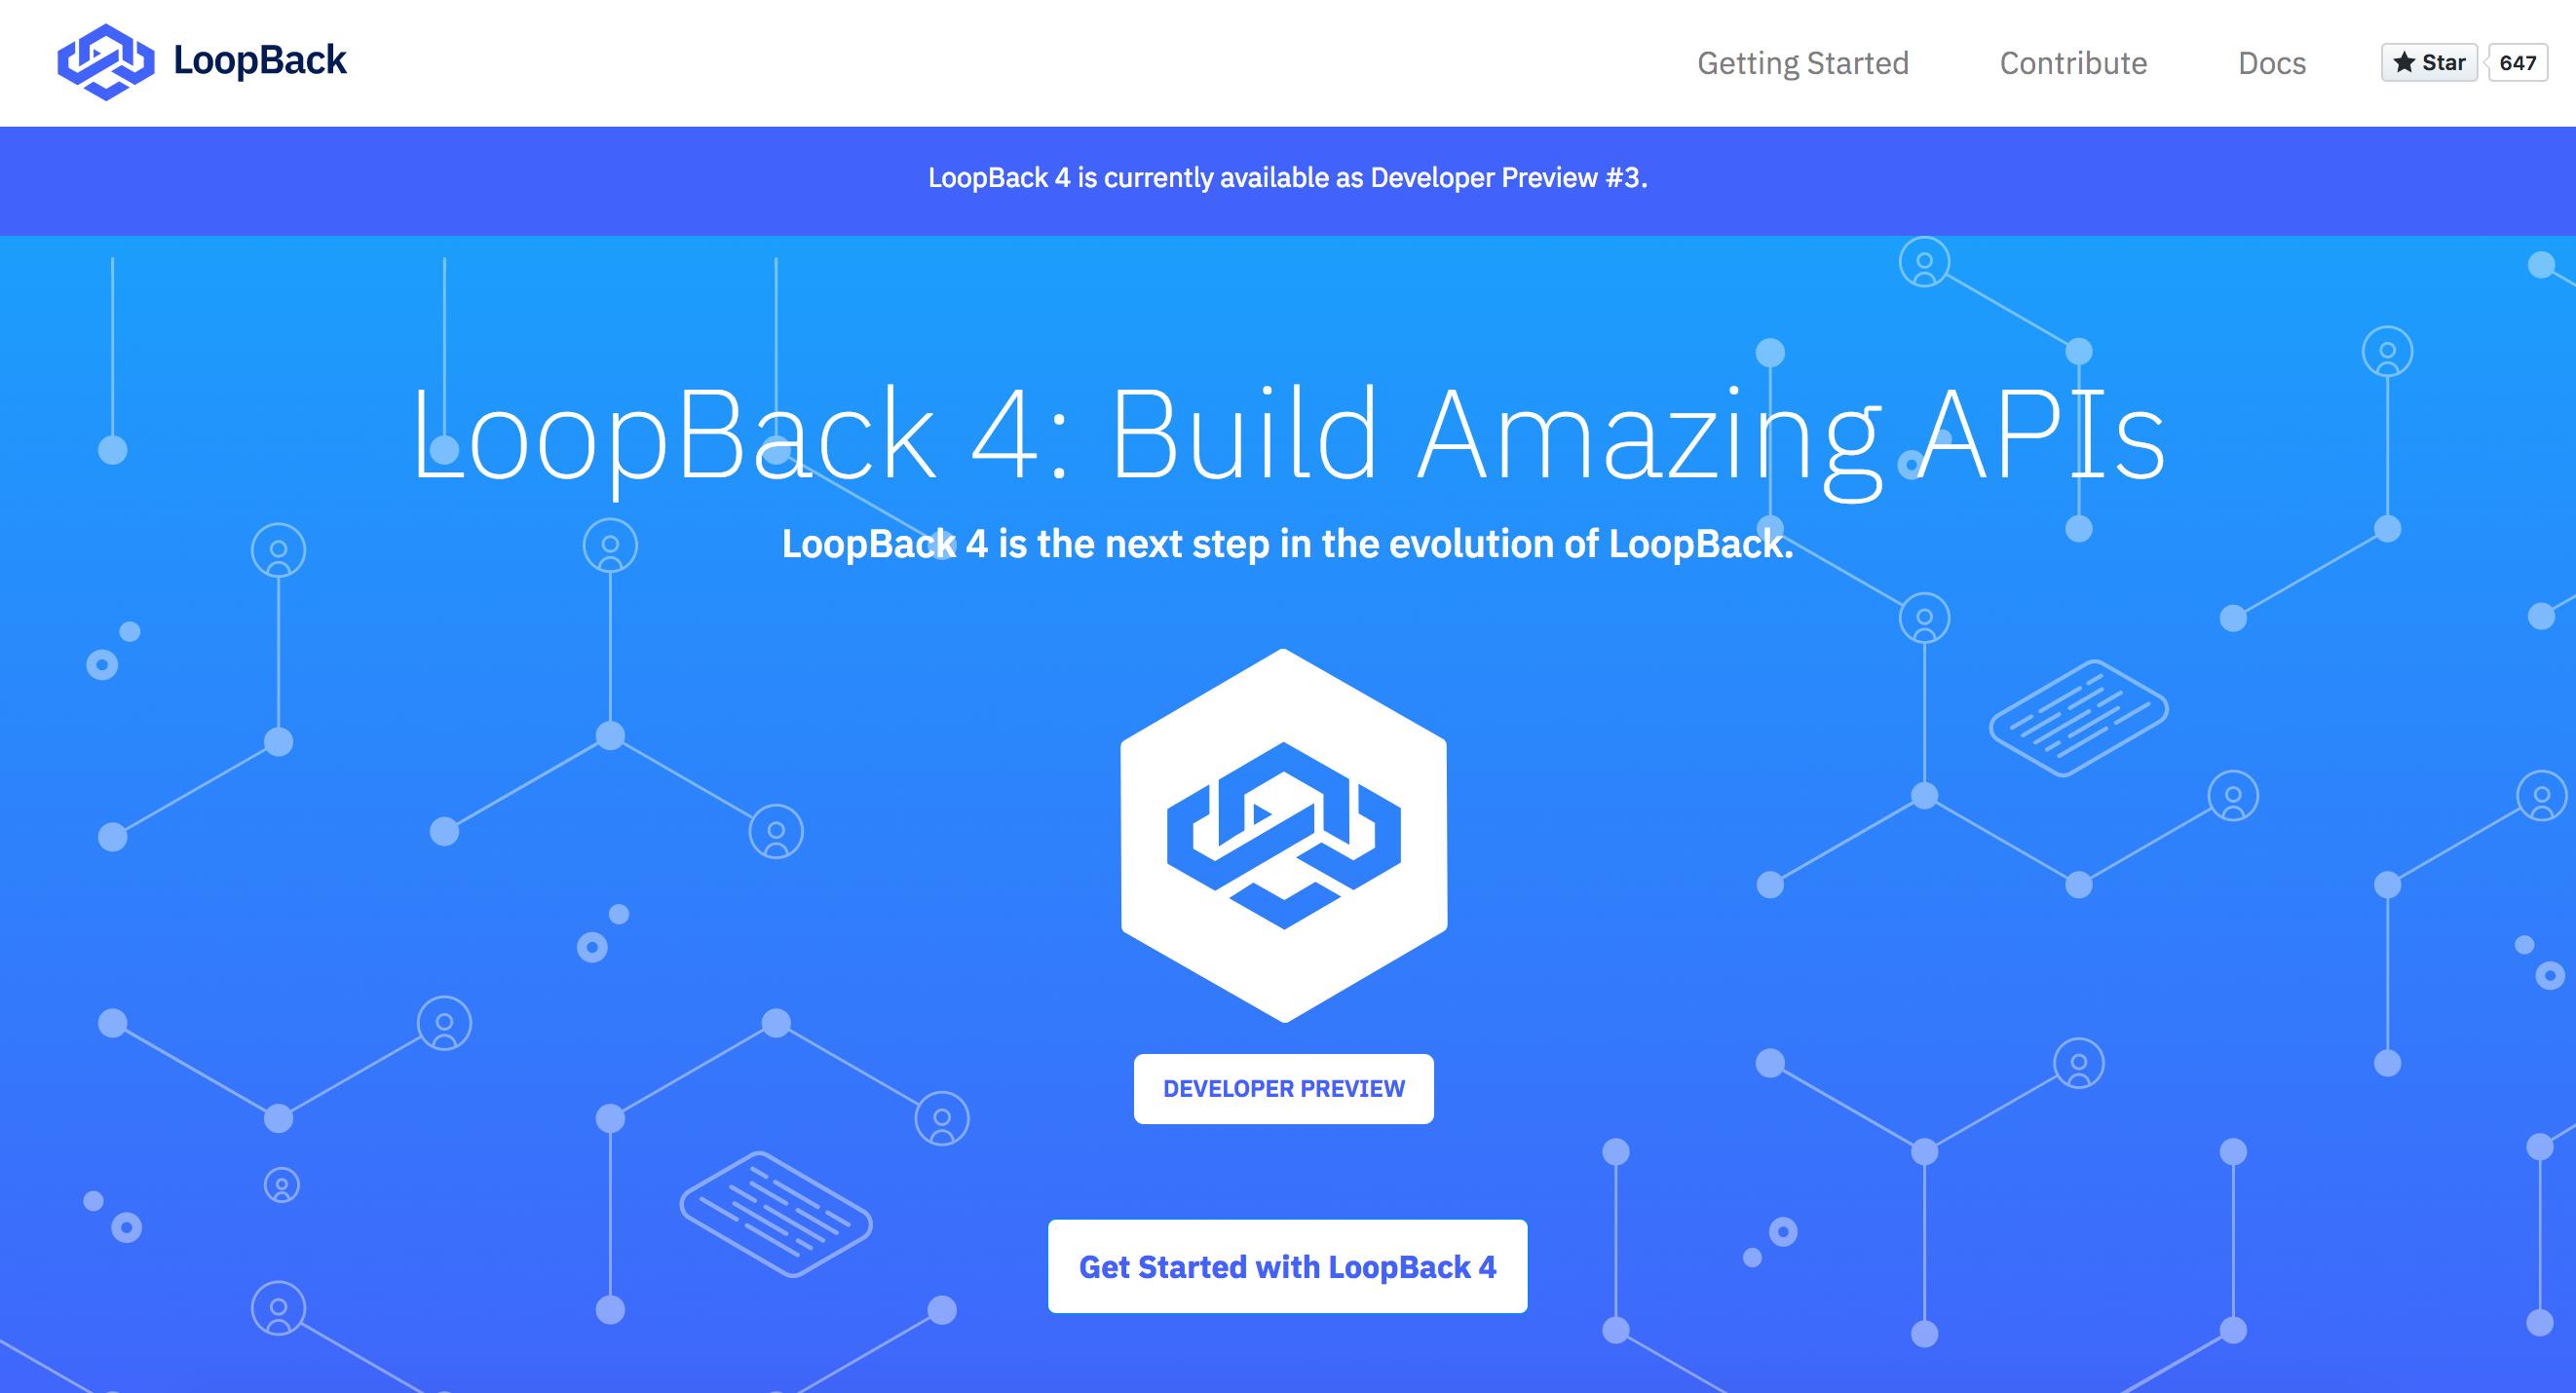 Screen shot of LoopBack 4 website